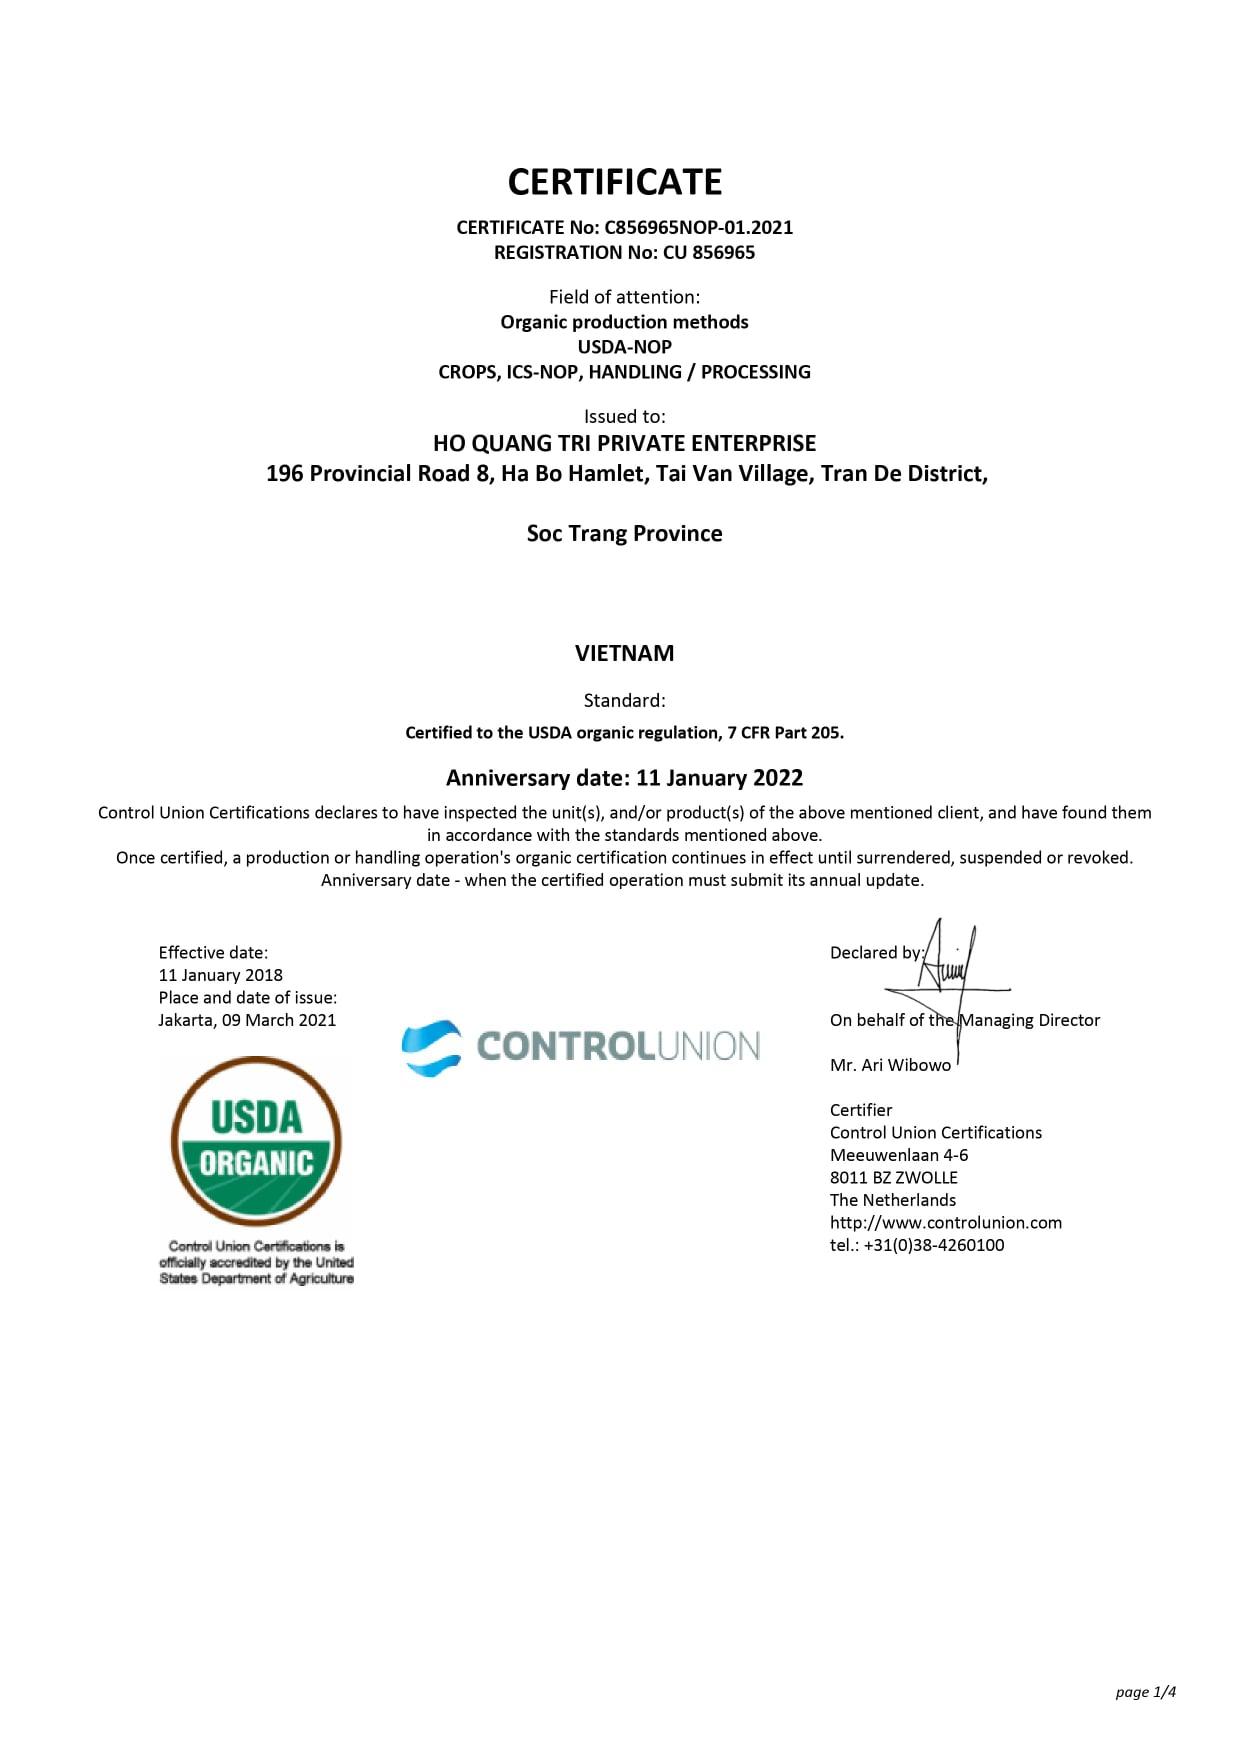 USDA Organic 2021